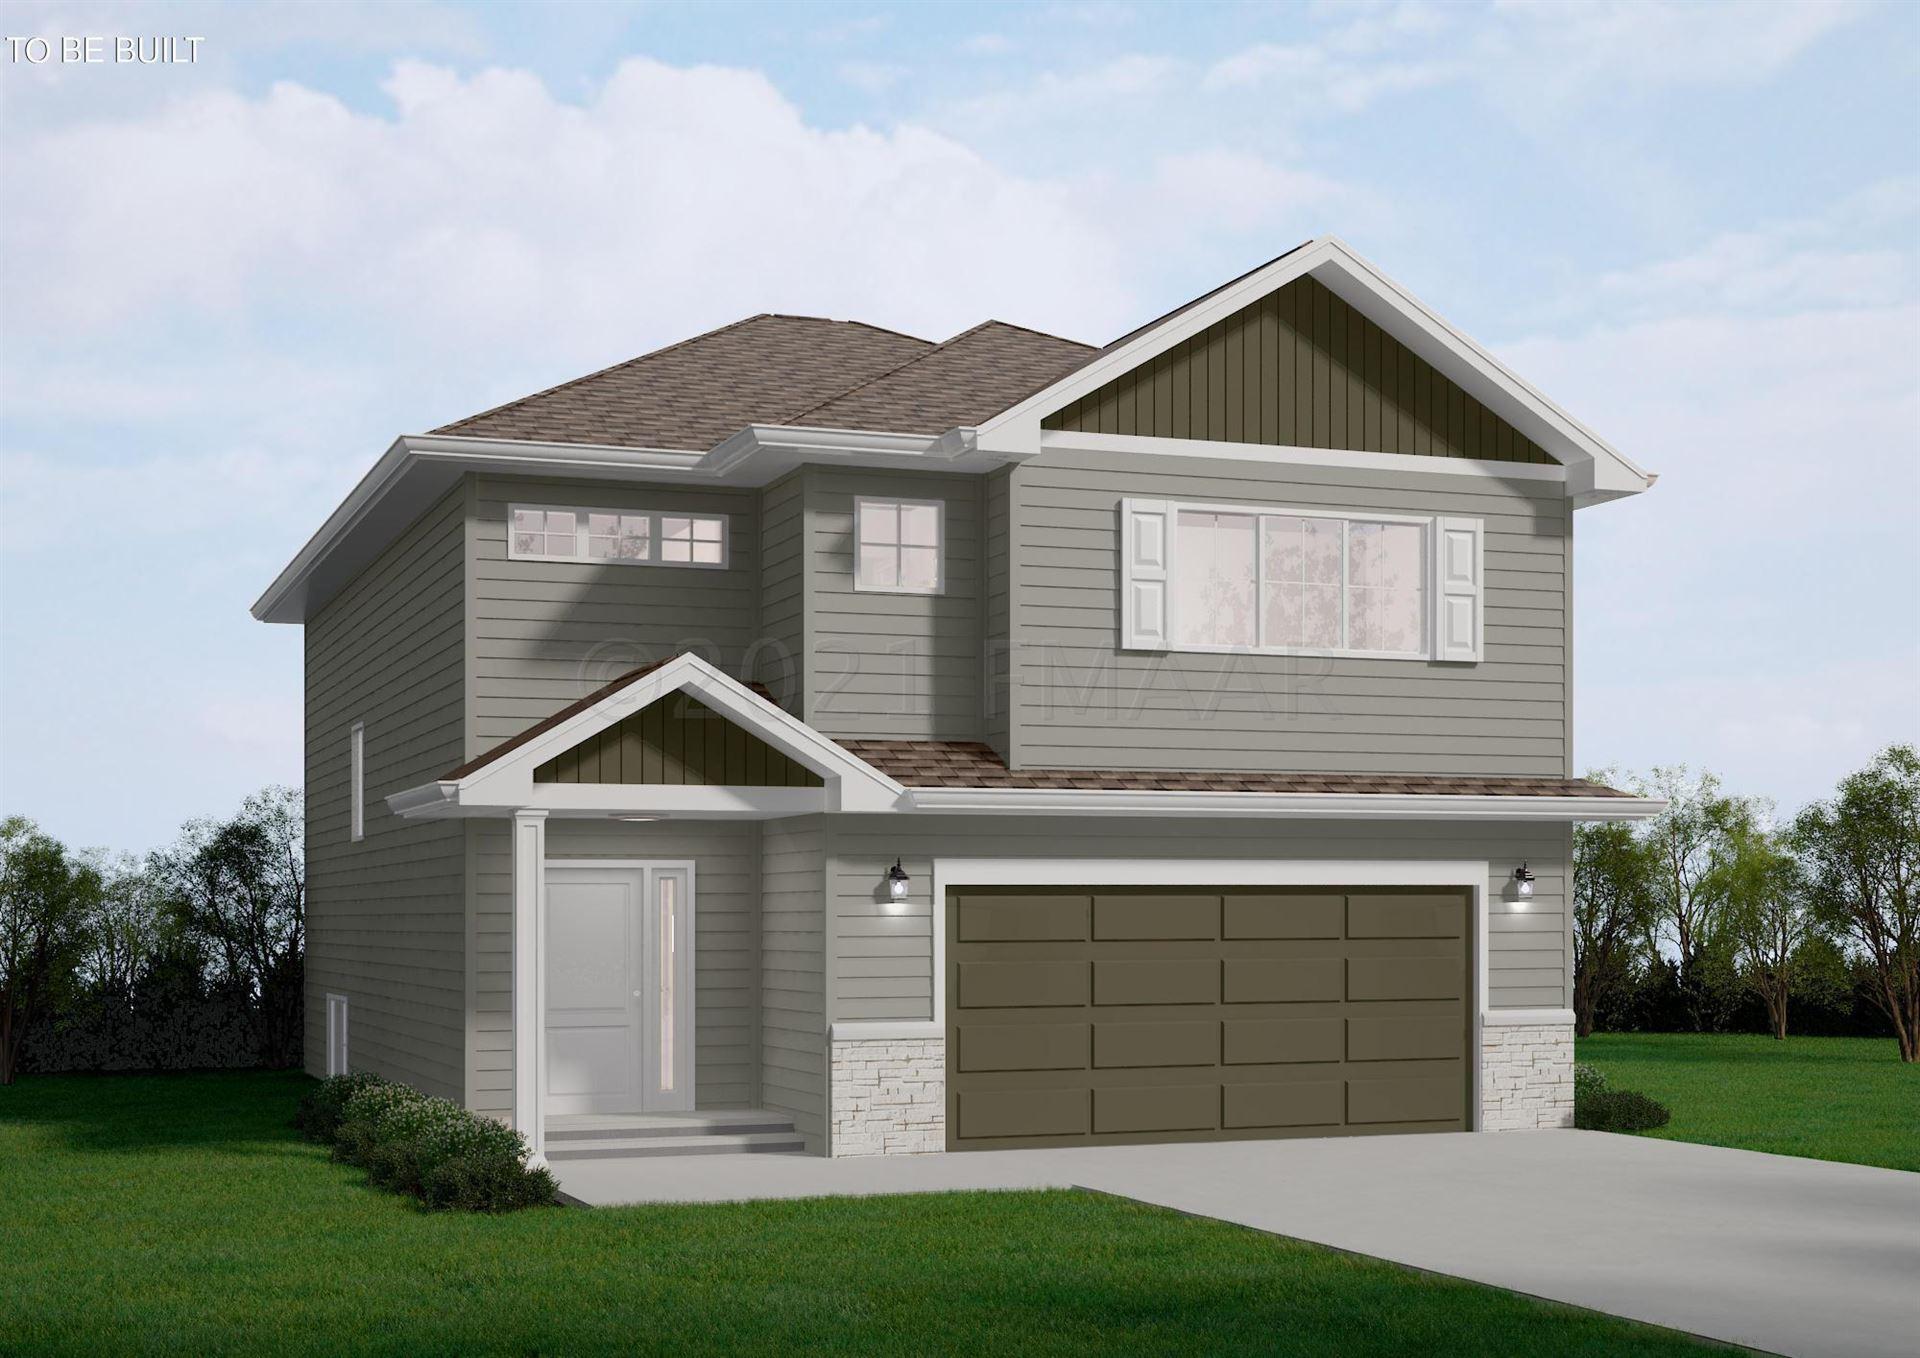 1054 ASHLEY Drive W, West Fargo, ND 58078 - #: 21-198